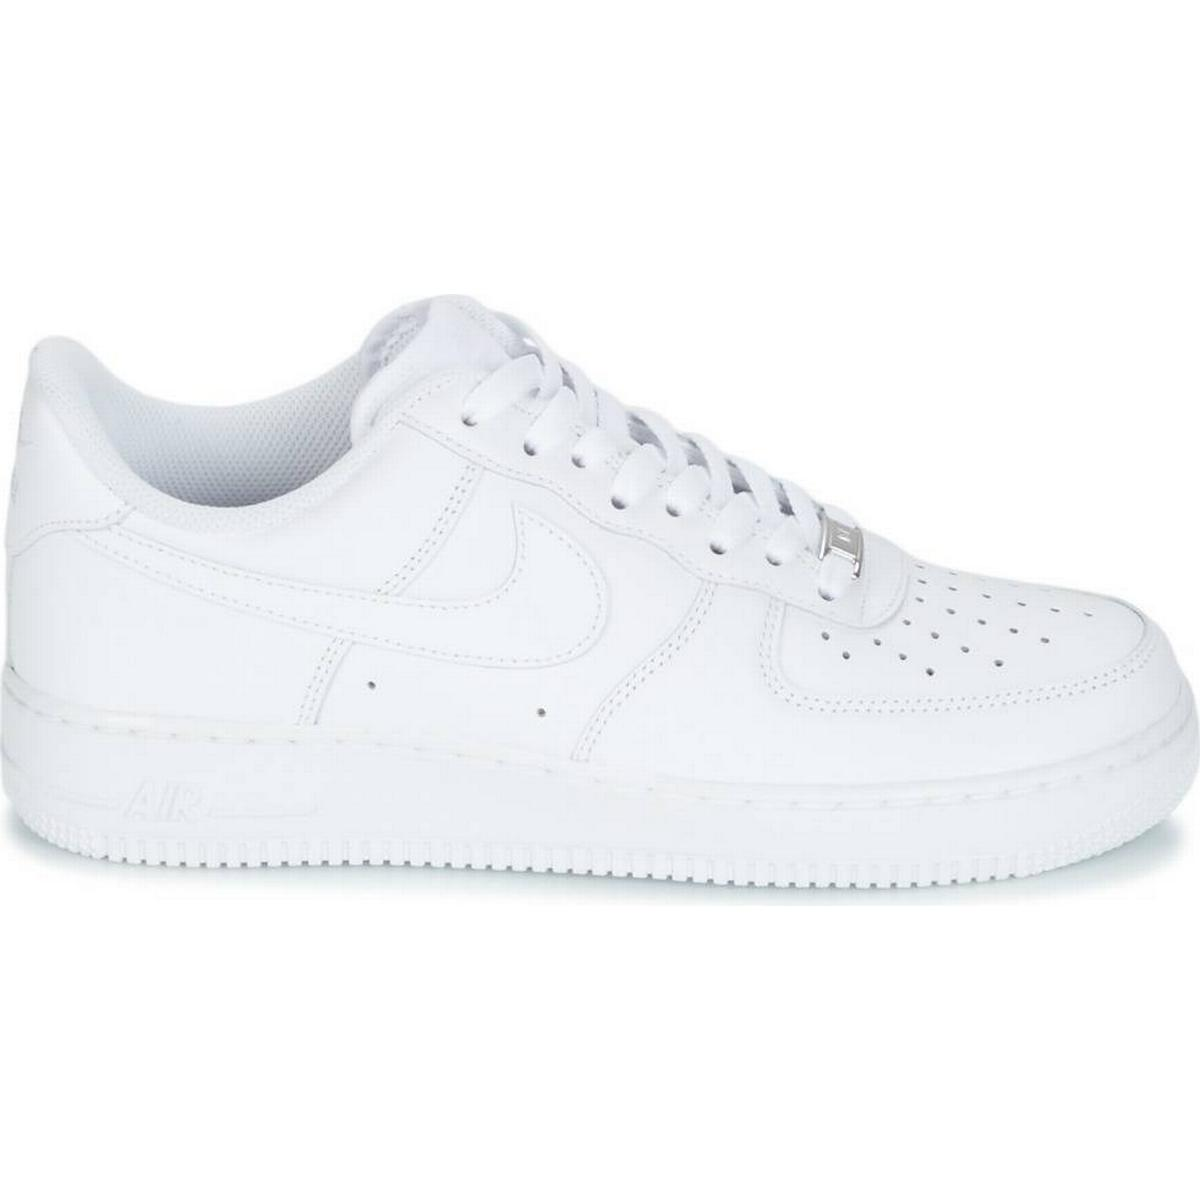 Nike Air Force 1 Sko (1000+ produkter) hos PriceRunner • Se